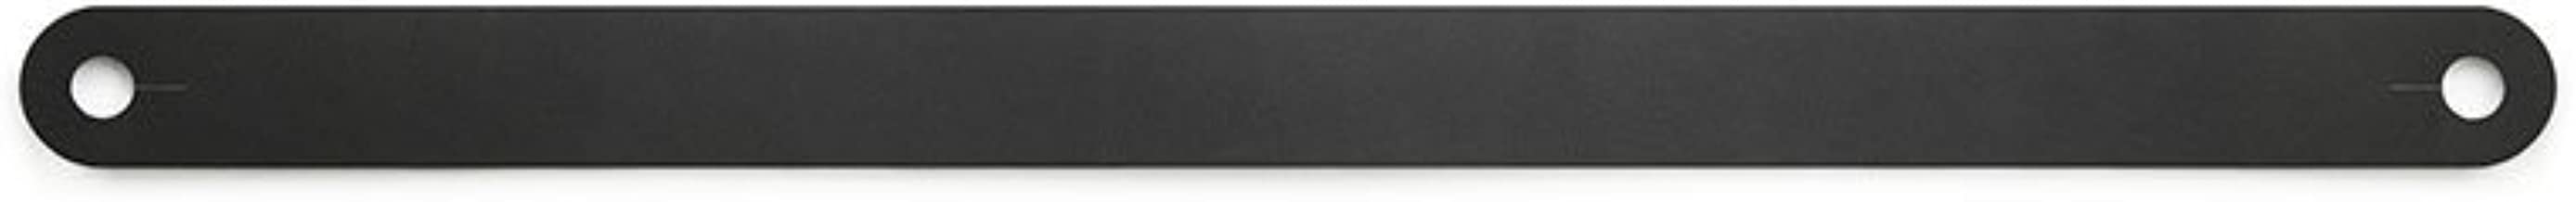 B&O Play by Bang & Olufsen Premium Bang & Olufsen Beolit 17 Strap Charcoal Black (1606439)